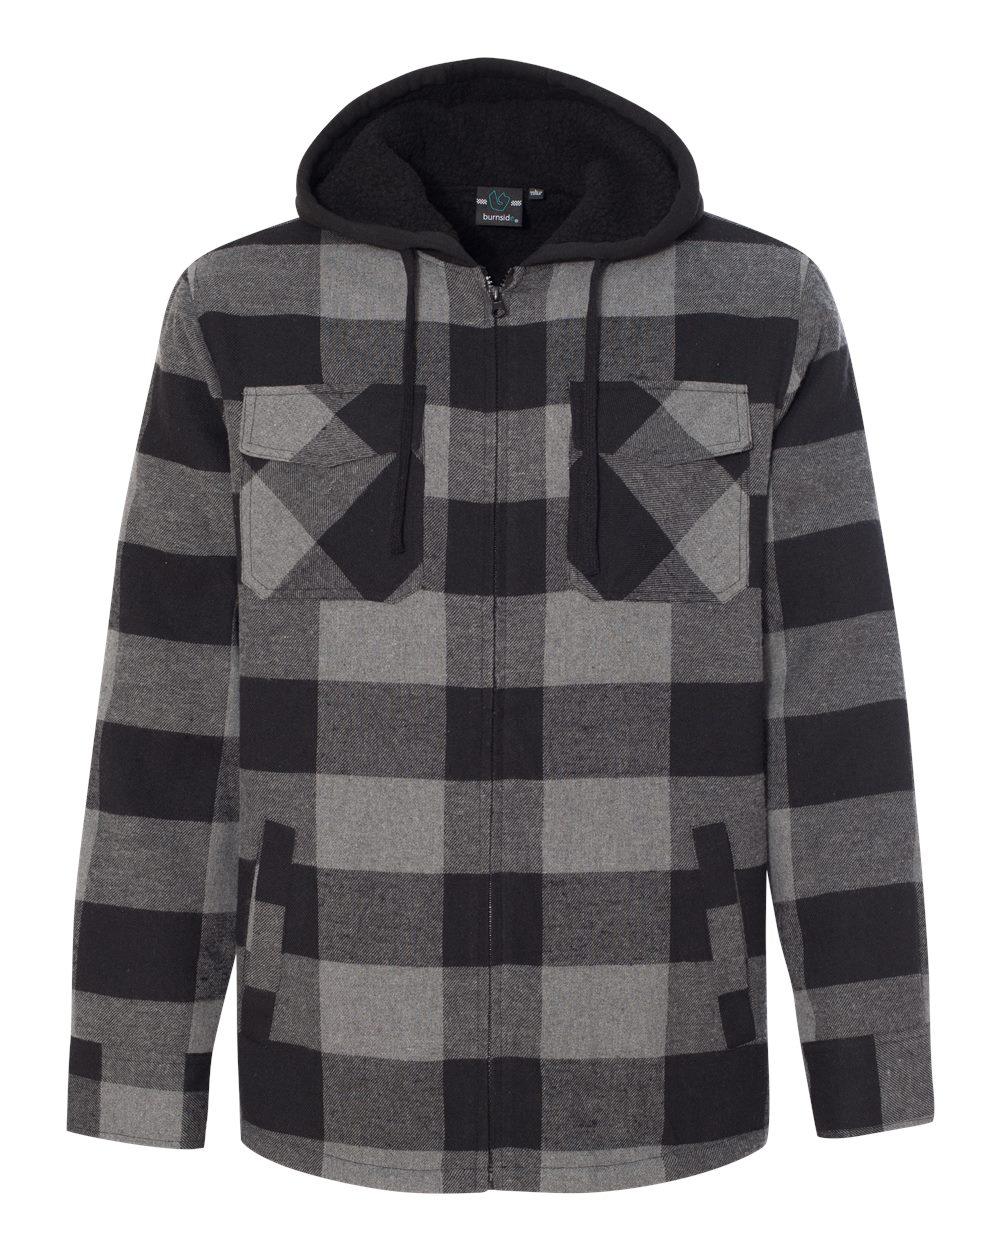 Burnside Men's Quilted Flannel Full-Zip Hooded Jacket, Style 8620